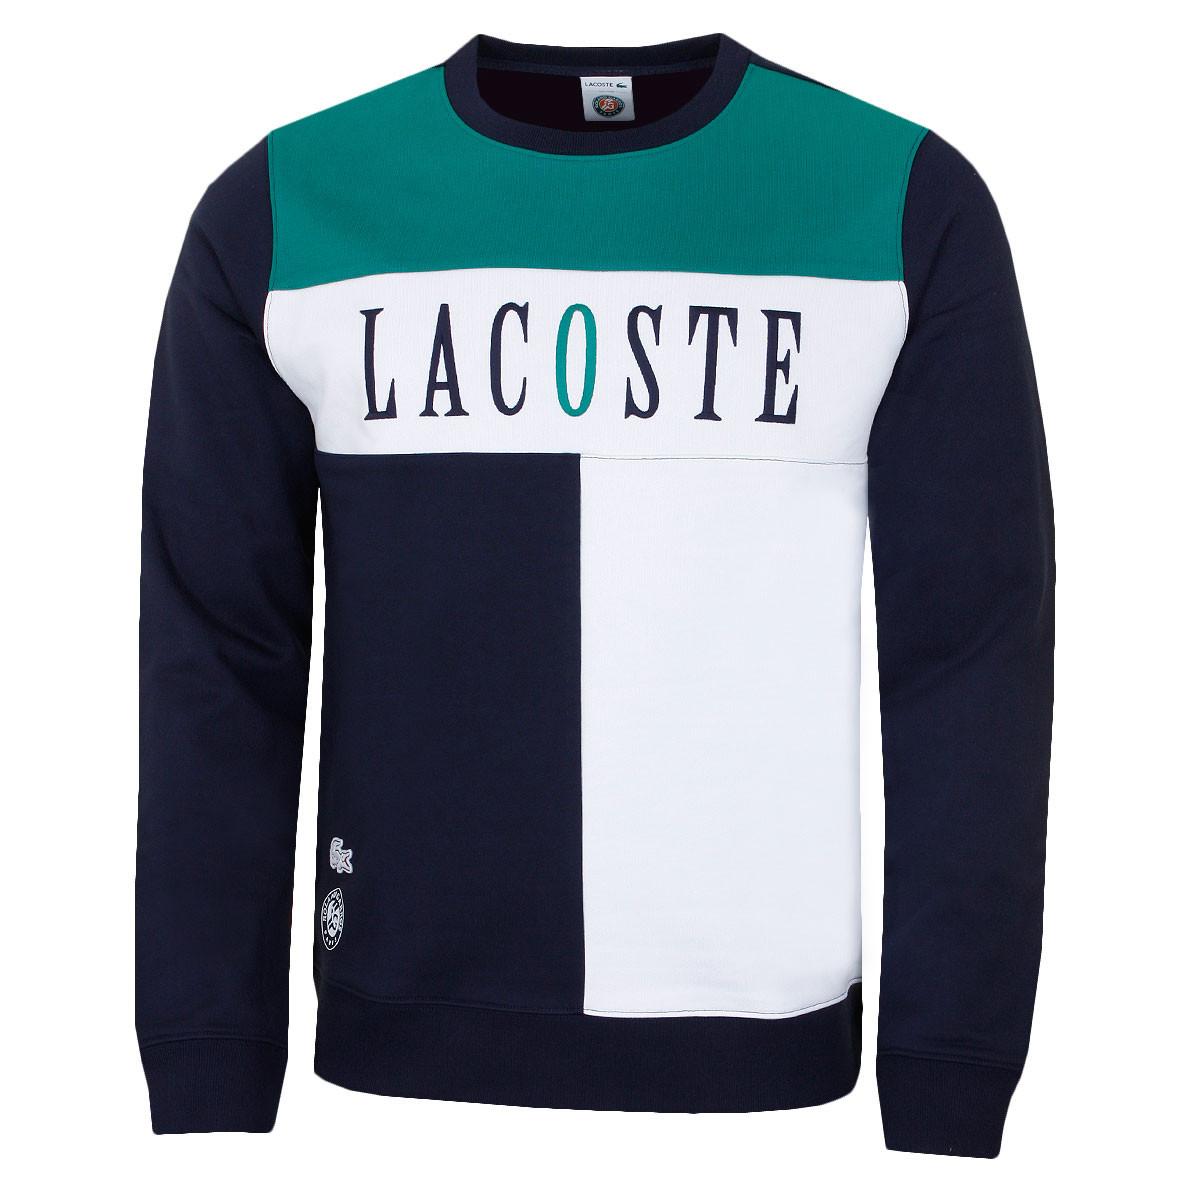 b36bab6f Lacoste Mens 2019 Seasonal Roland Garros Sweater